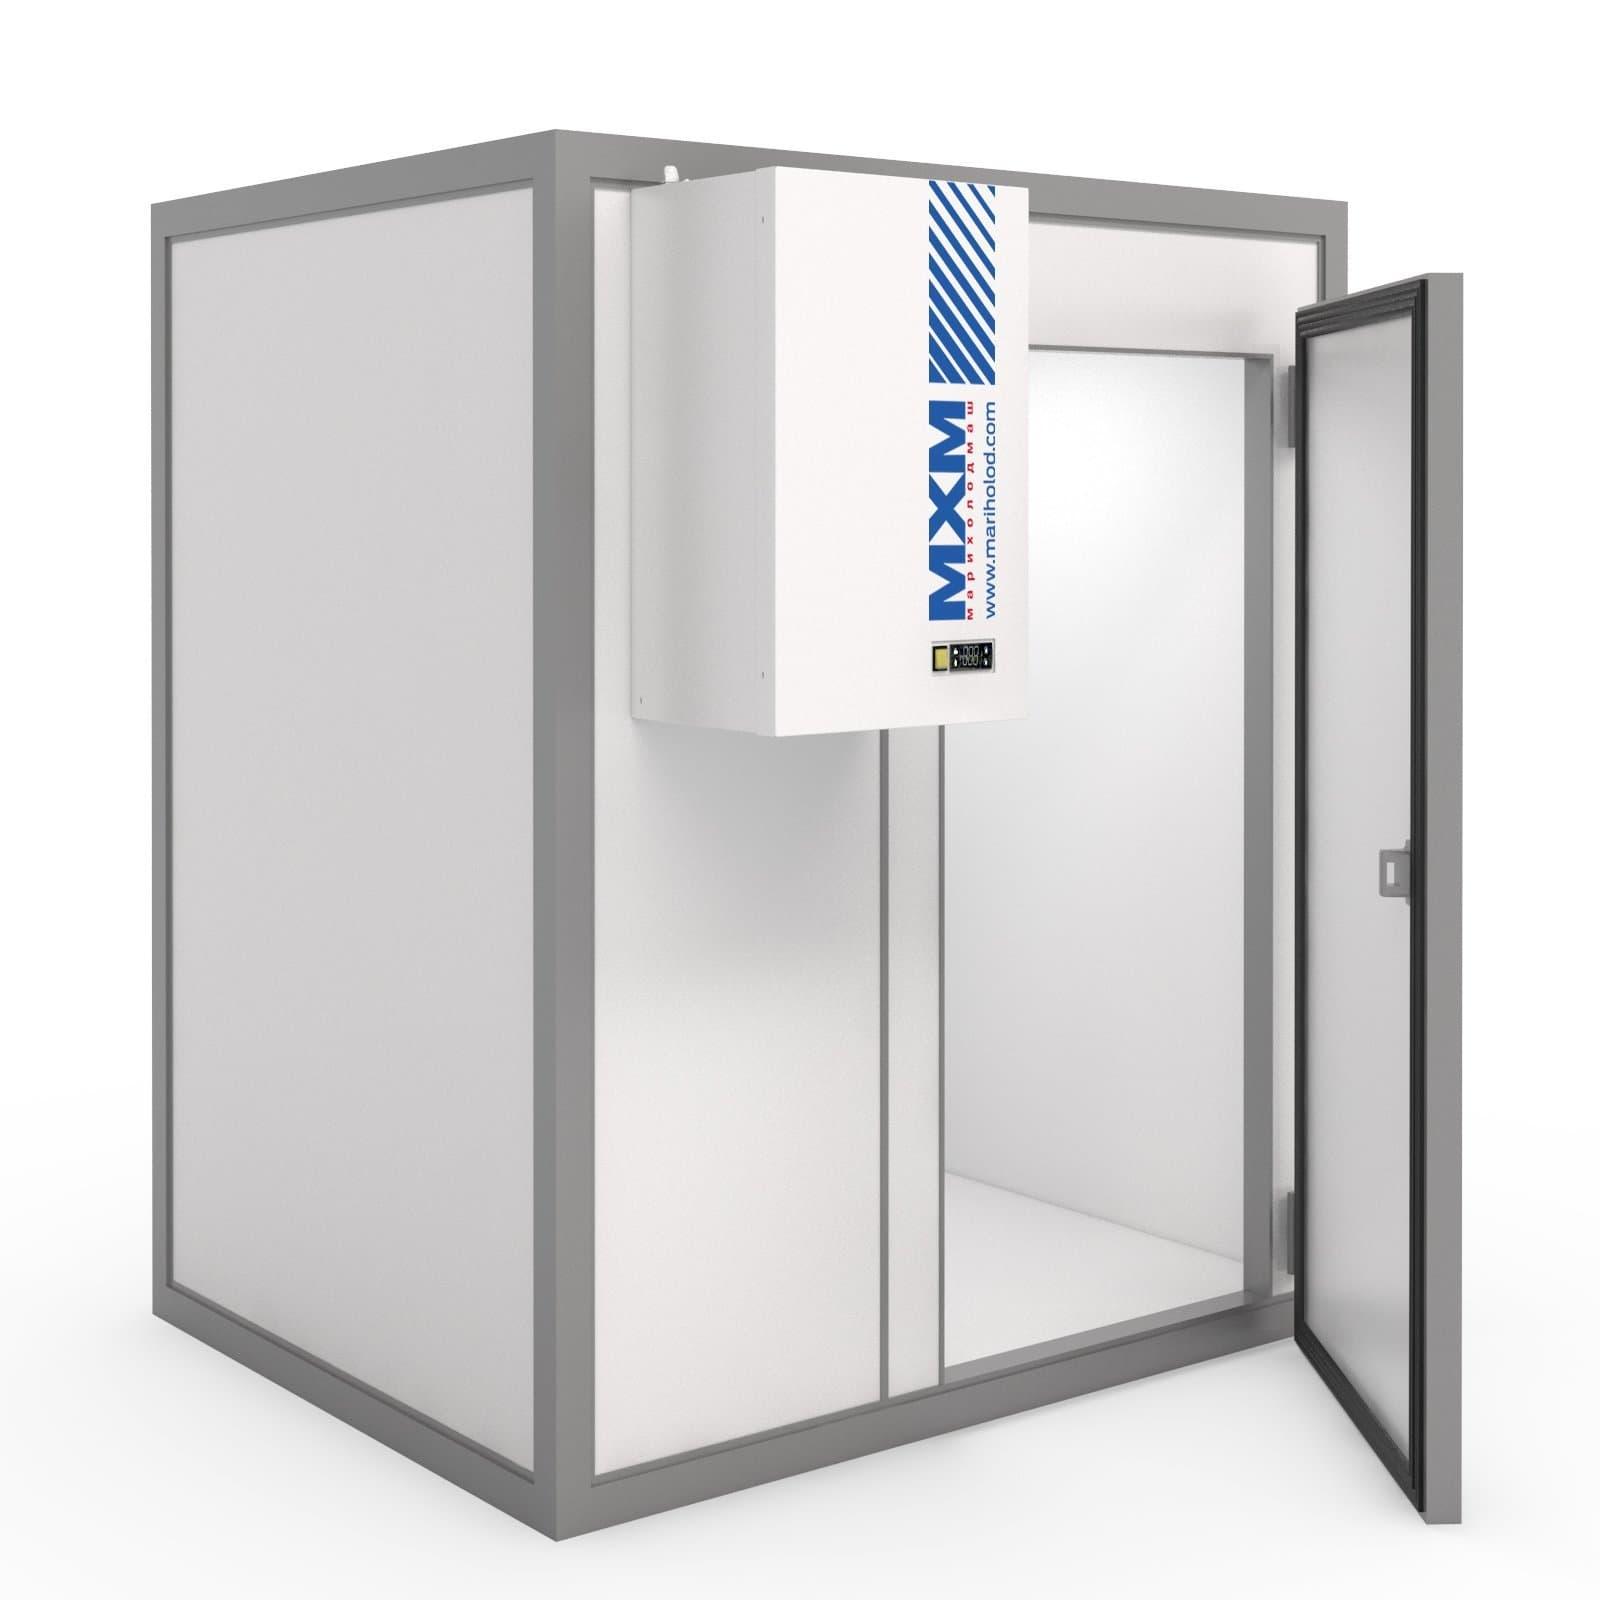 Камера холодильная МХМ КХН-15,94 2260×3460×2460